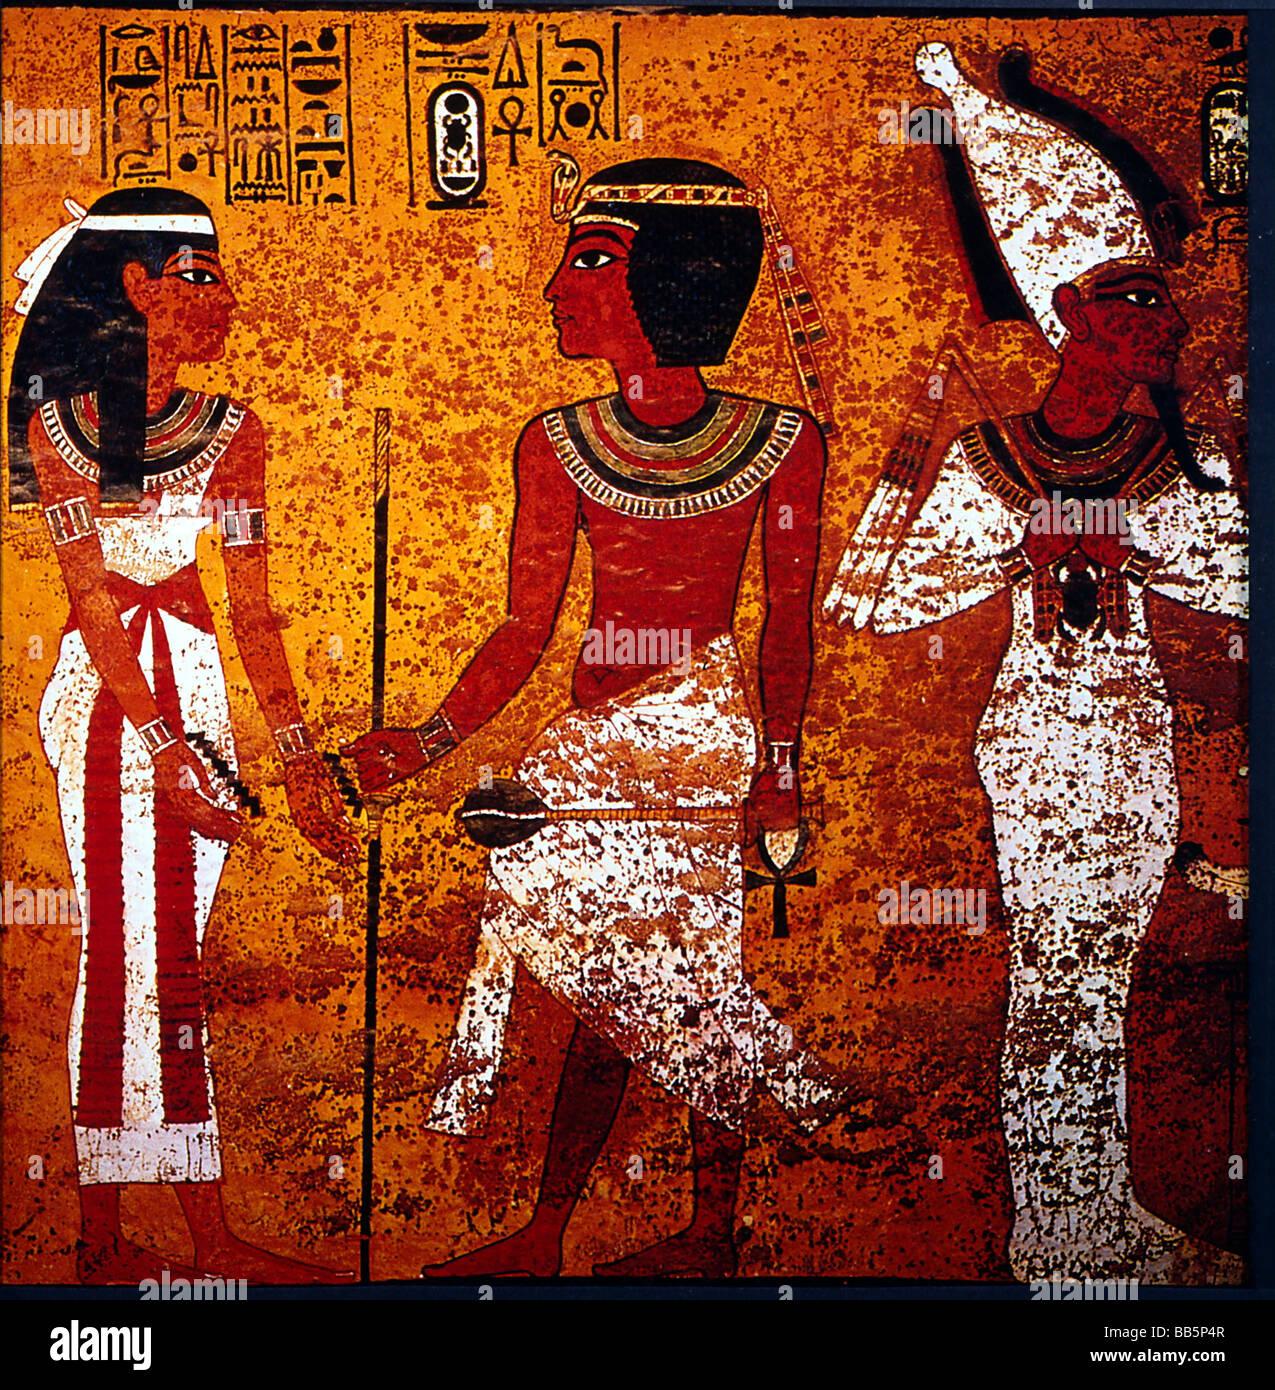 Tutankhamun, King of Egypt, 1333 - 1323 BC, 18th Dynasty, full length, with Goddes Nut and God Osiris, mural painting, - Stock Image